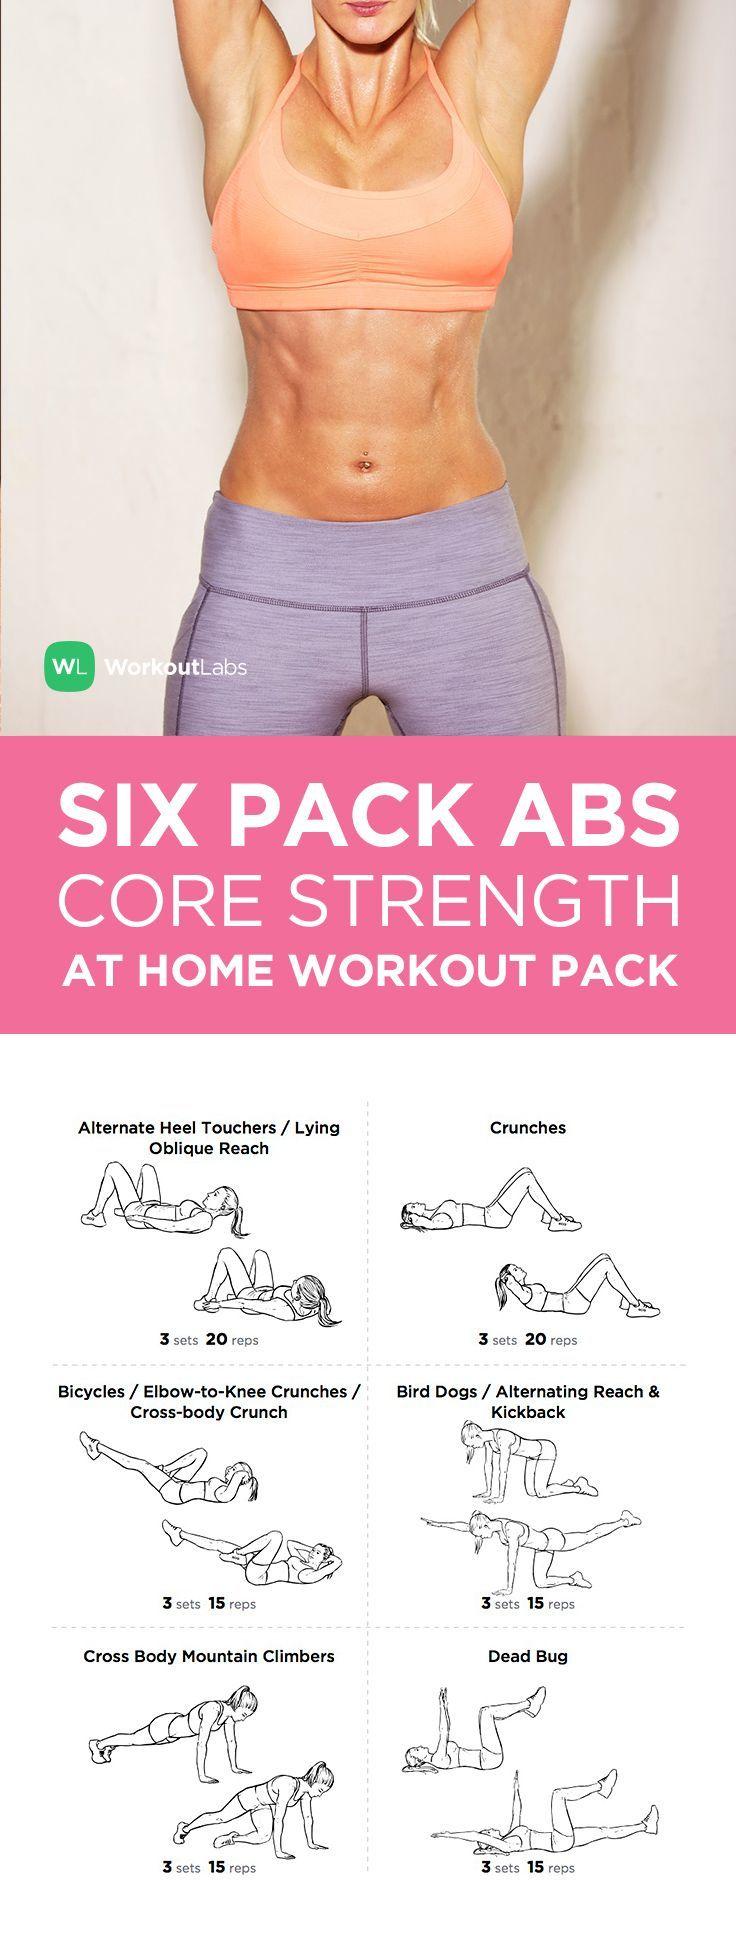 Six Pack Bauchstraffung zu Hause Workout Pack für Männer